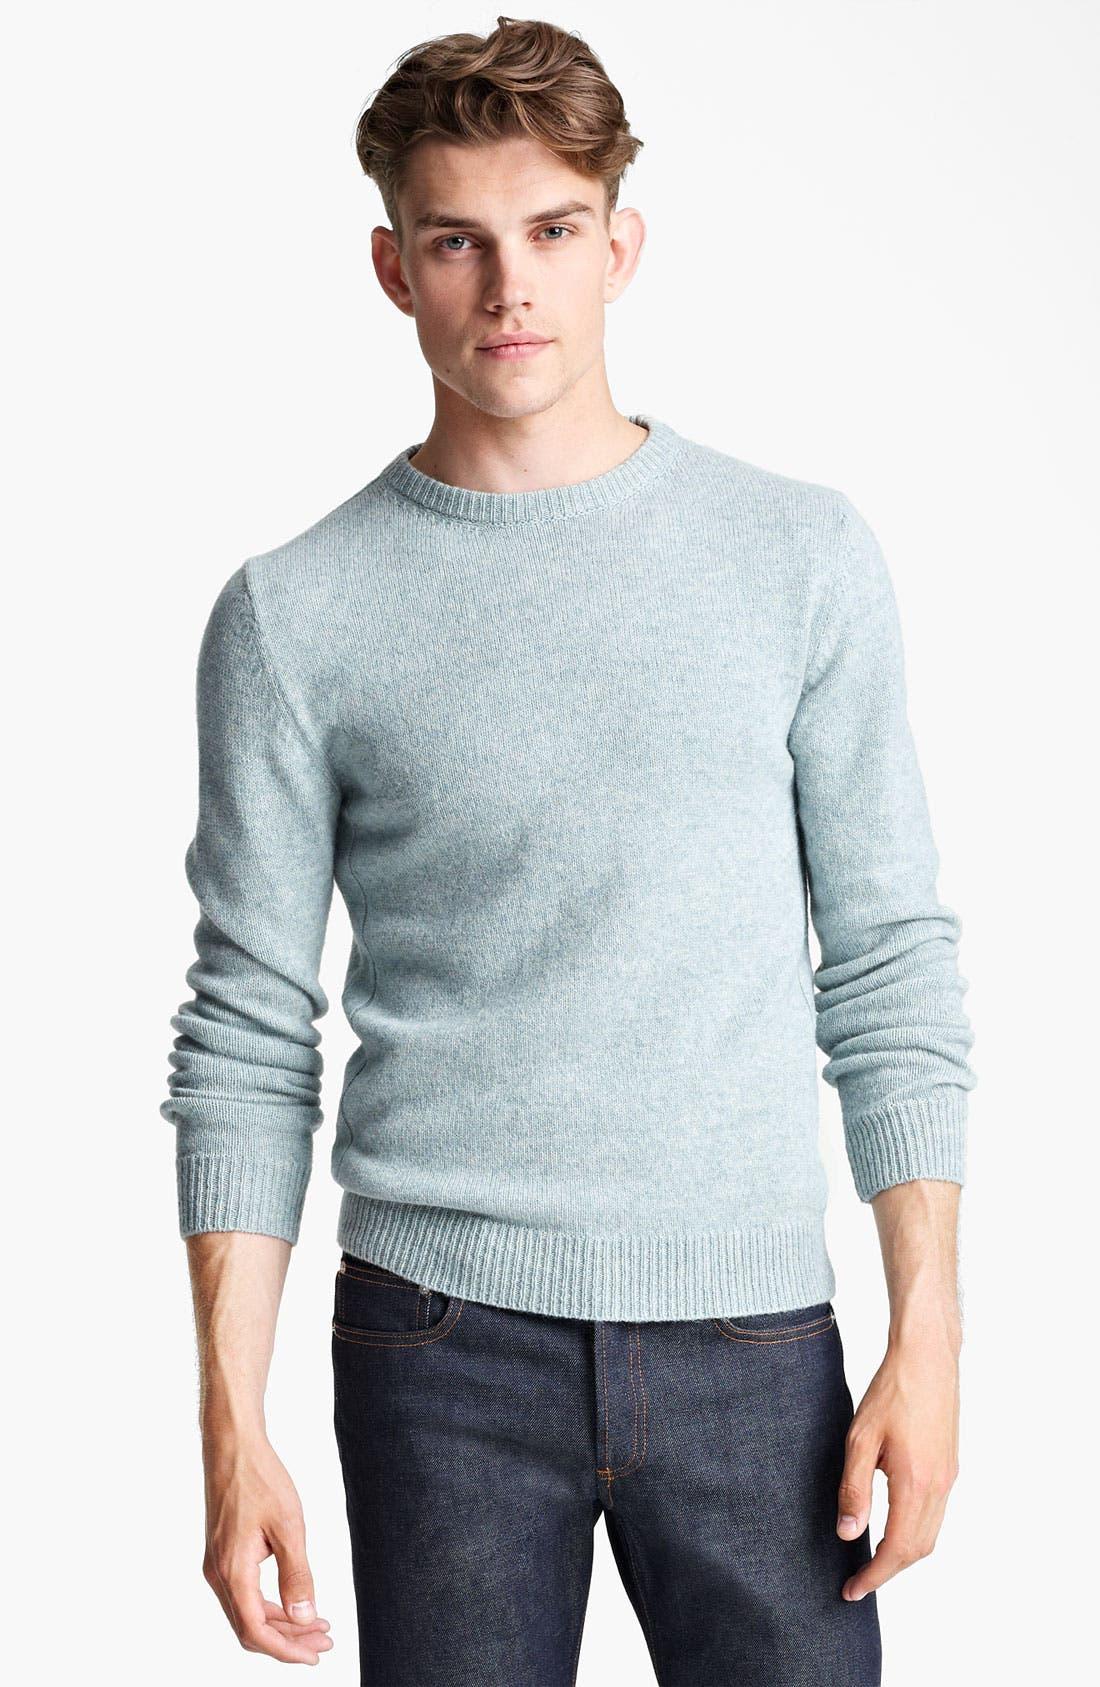 Alternate Image 1 Selected - A.P.C. Crewneck Sweater